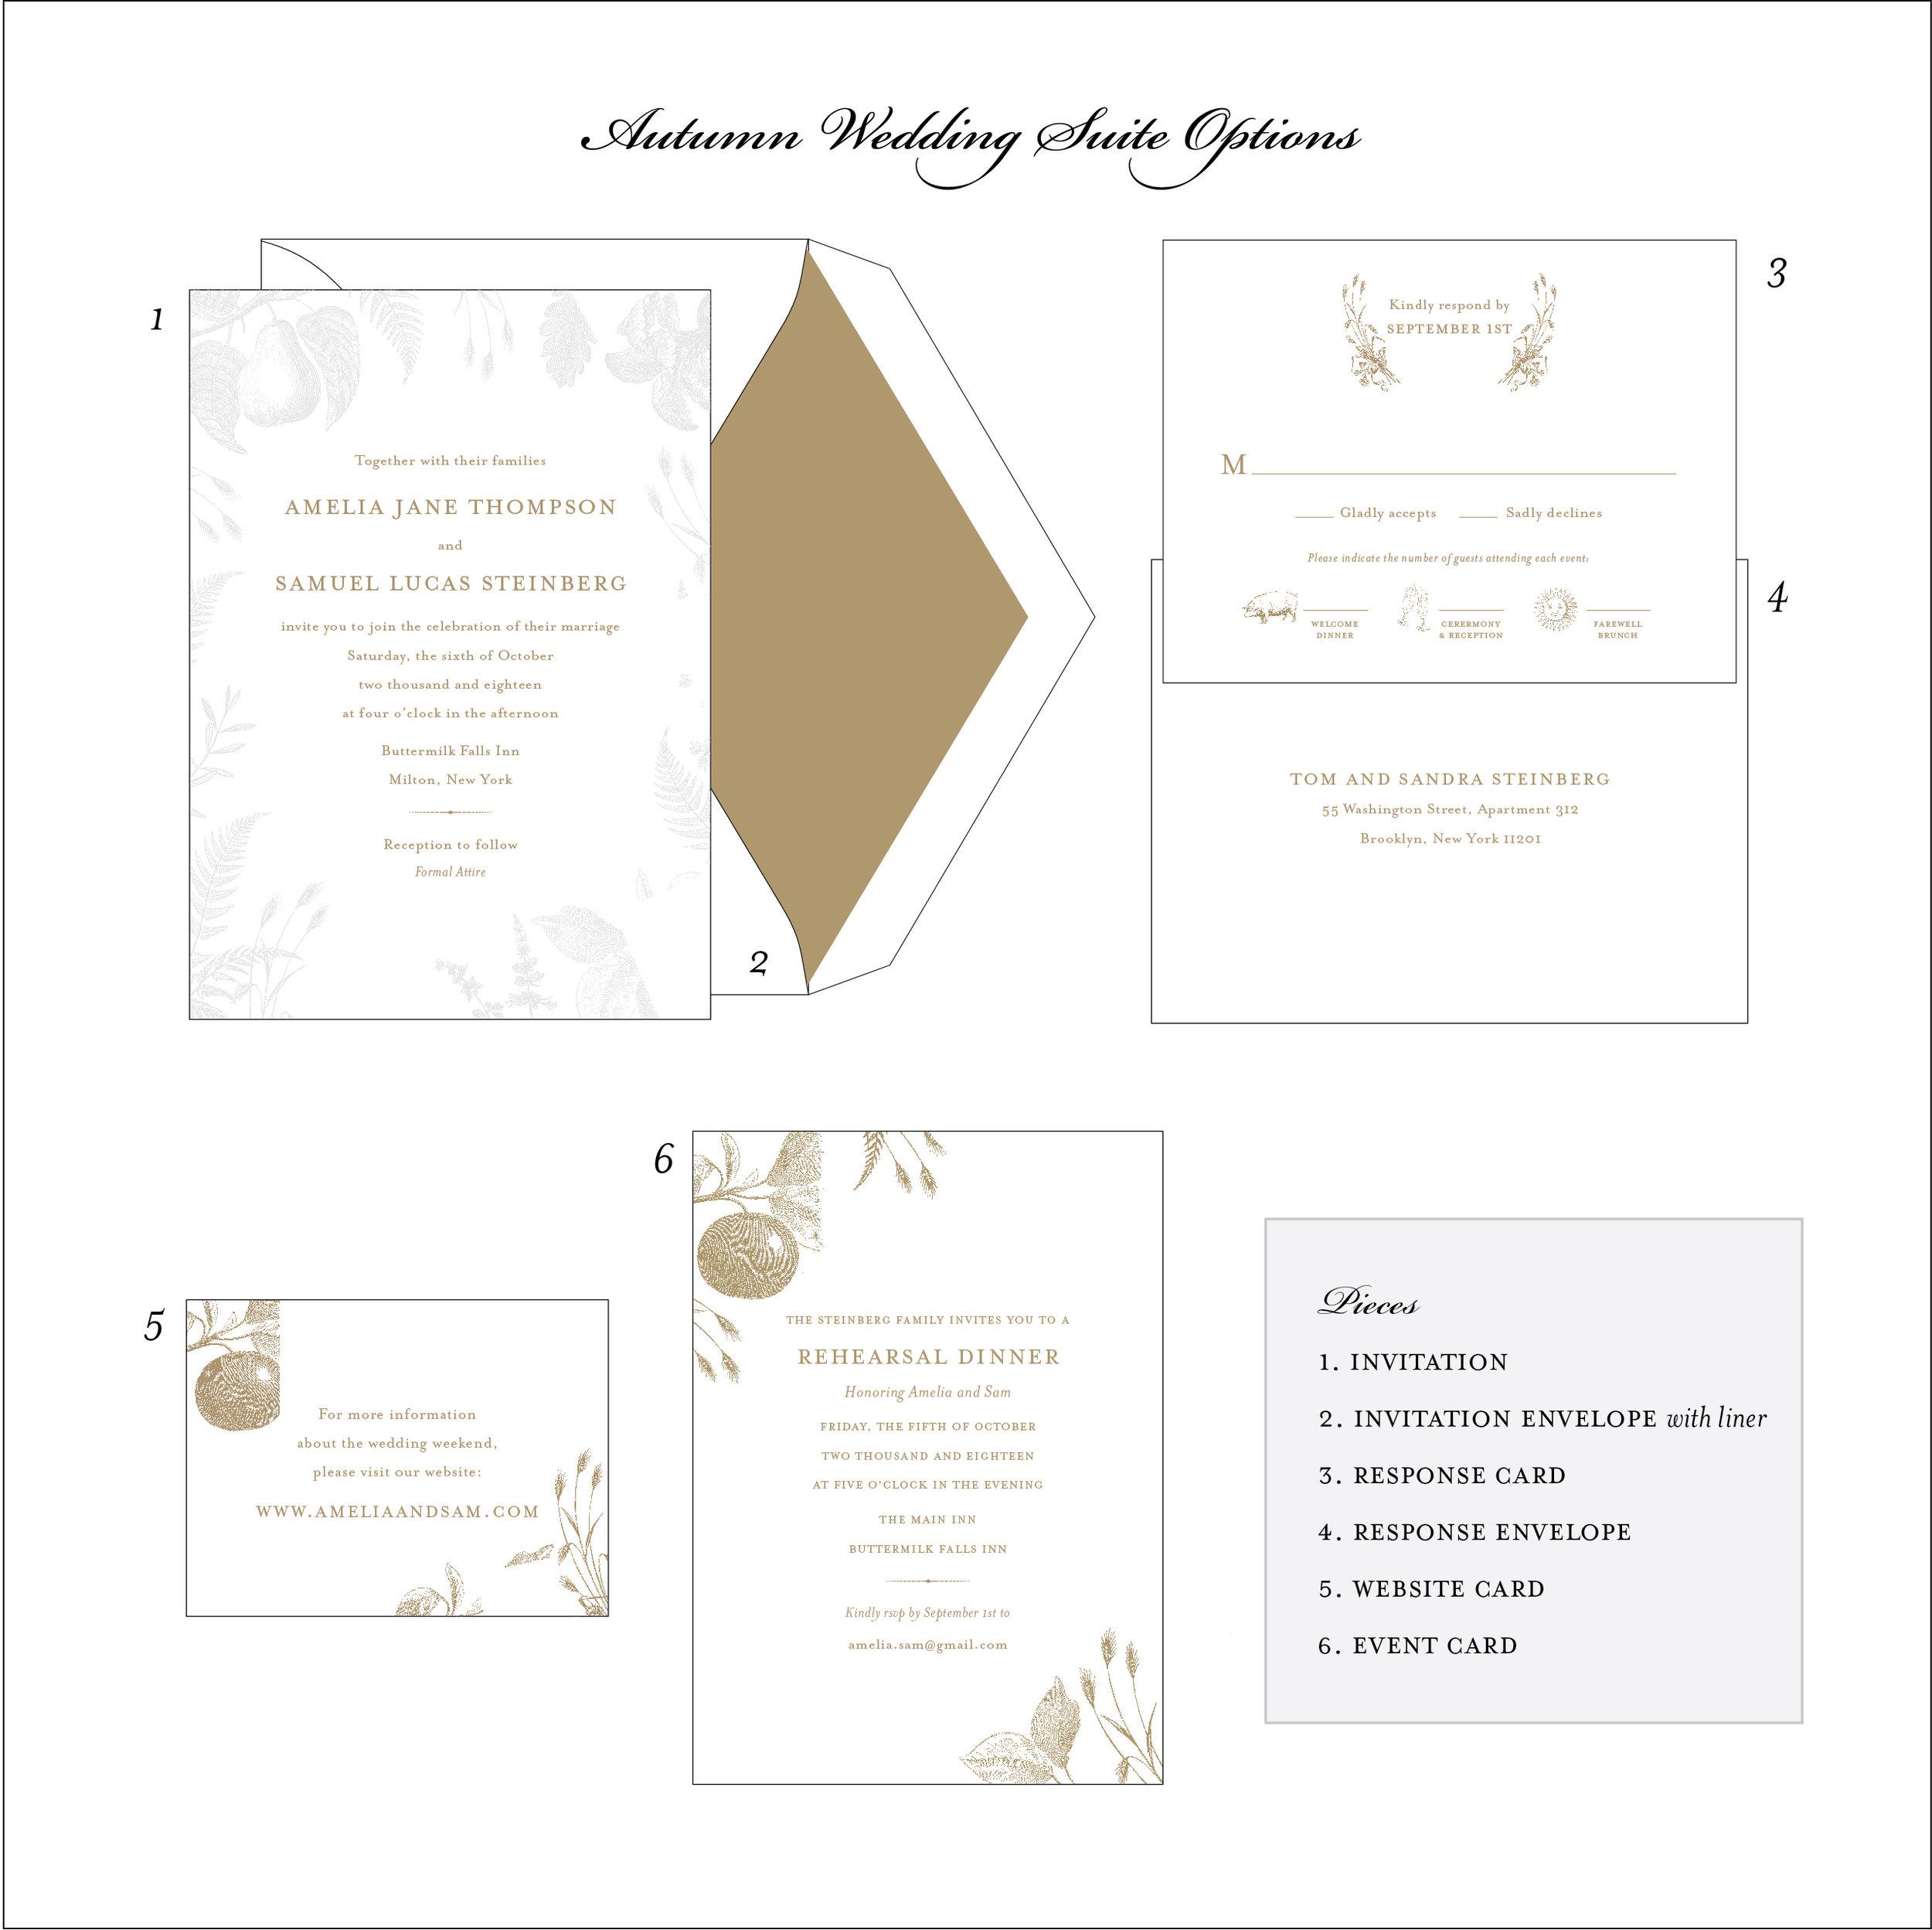 Website_Invite_Options-AUTUMN-A.jpg